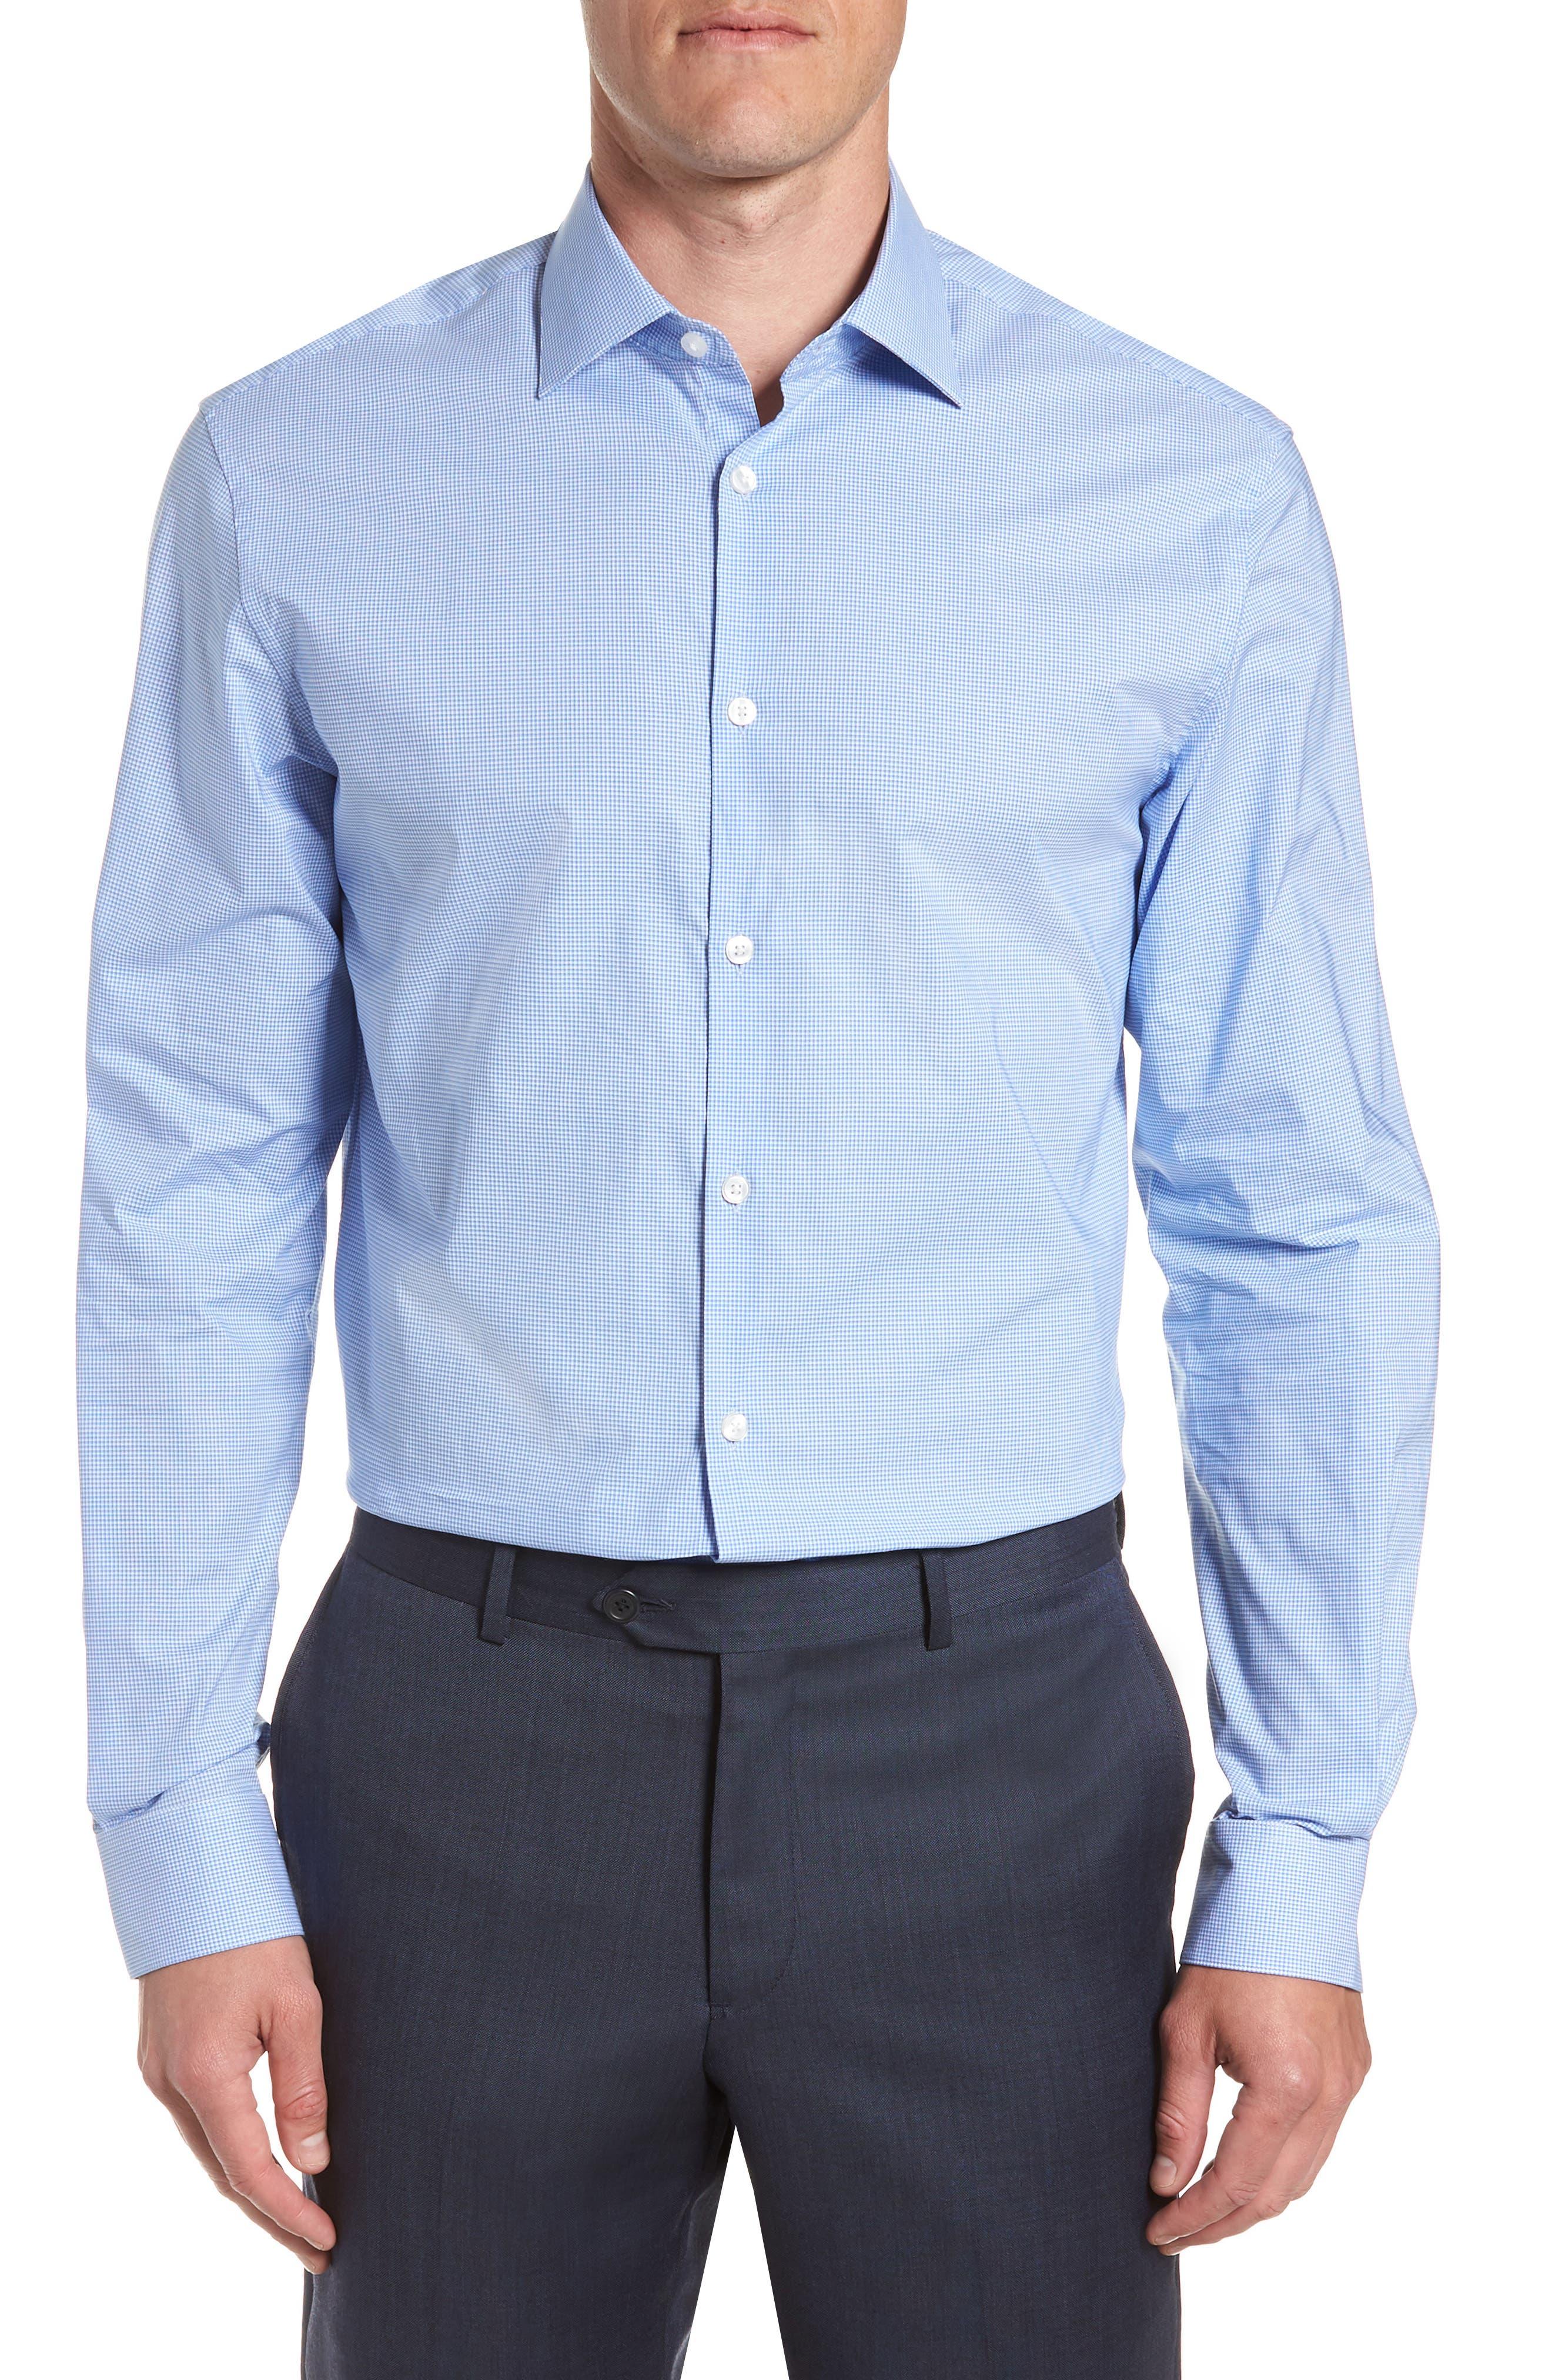 Microcheck Regular Fit Dress Shirt,                             Main thumbnail 1, color,                             OCEAN BLUE